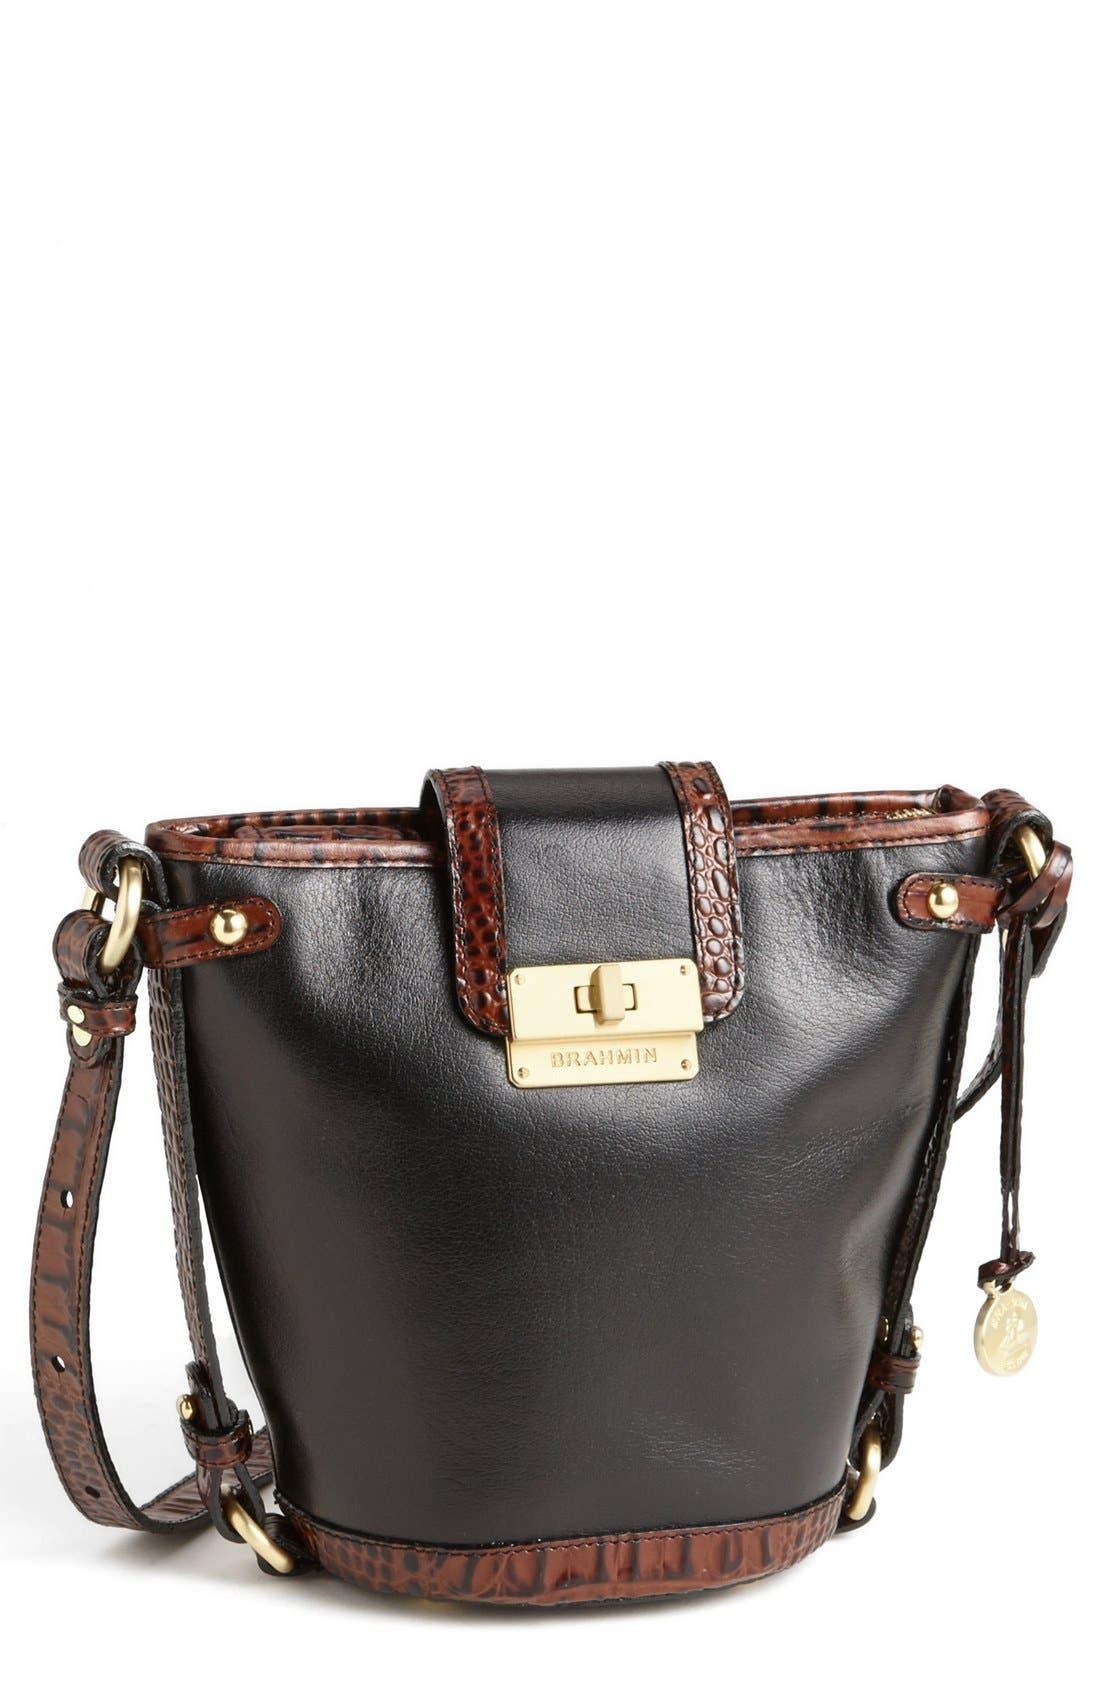 Alternate Image 1 Selected - Brahmin 'Tuscan Oxford' Crossbody Bag